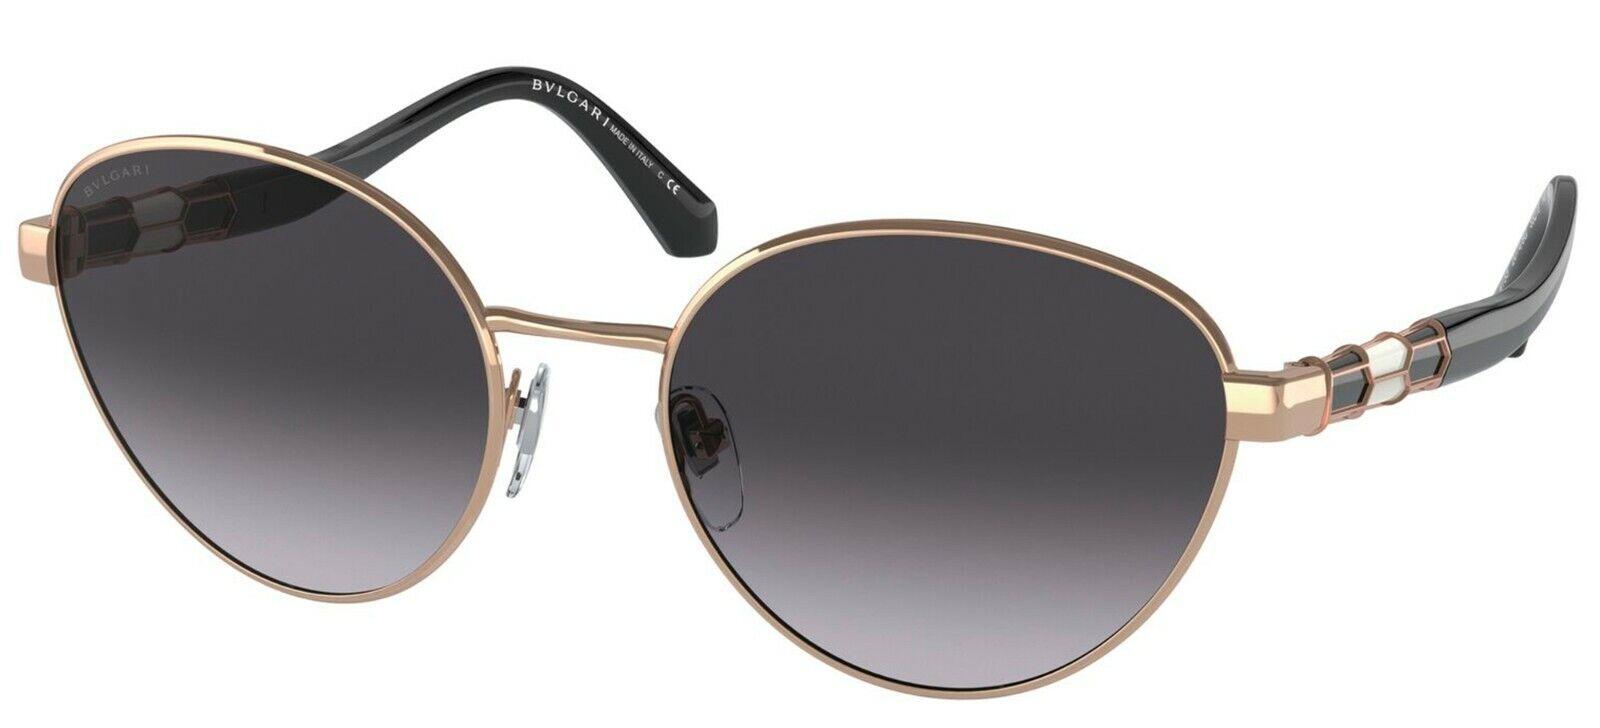 Bvlgari SERPENTI BV 6155 Rose Gold/Grey Shaded (2014/8G) Sunglasses